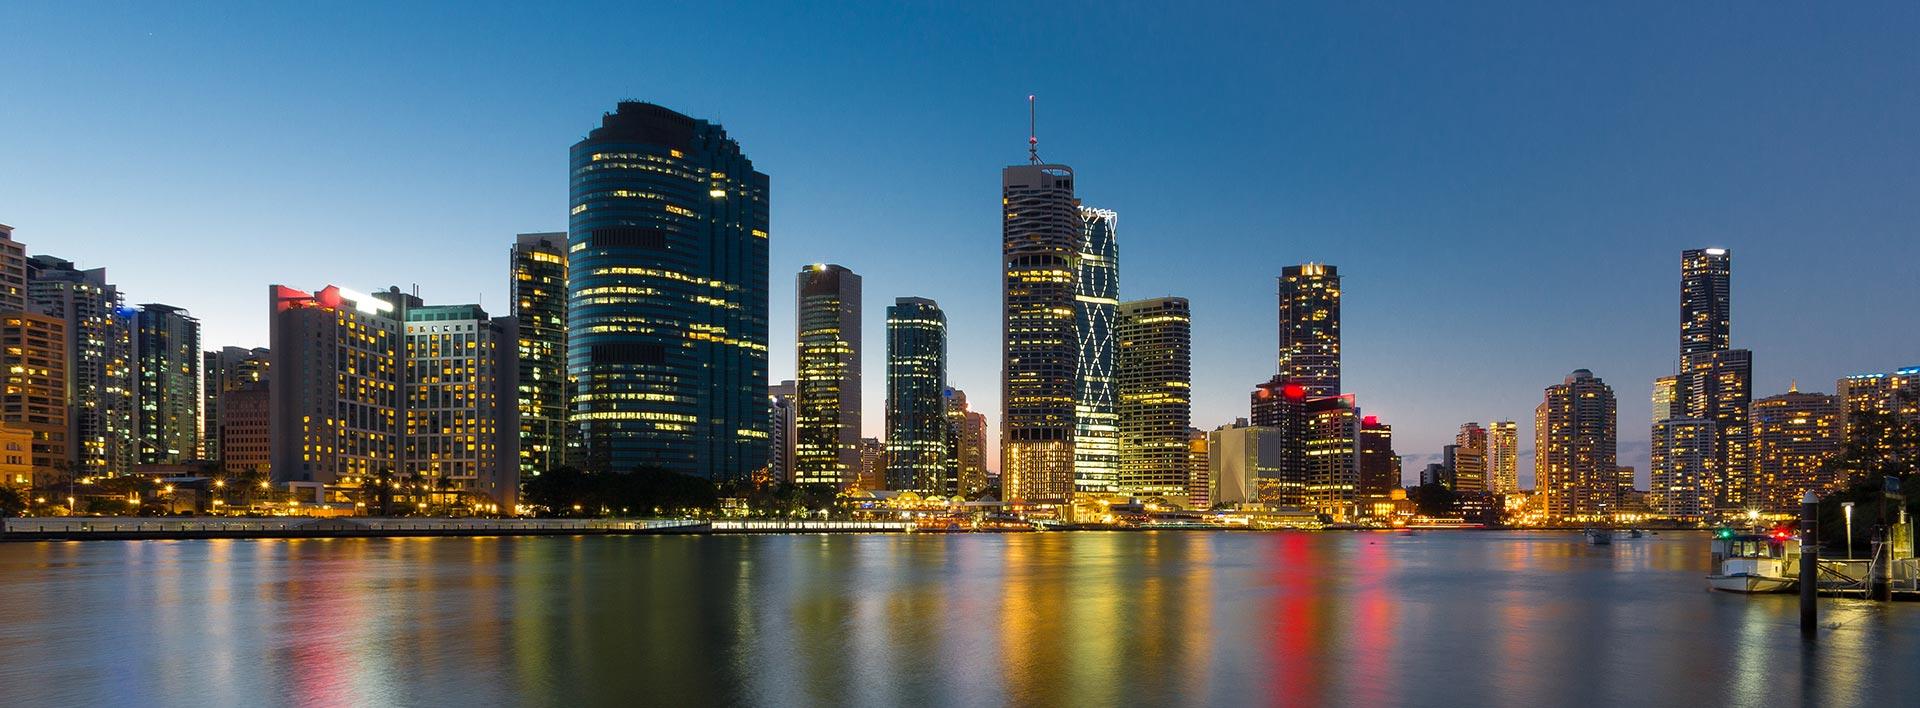 Based in Brisbane, Australia